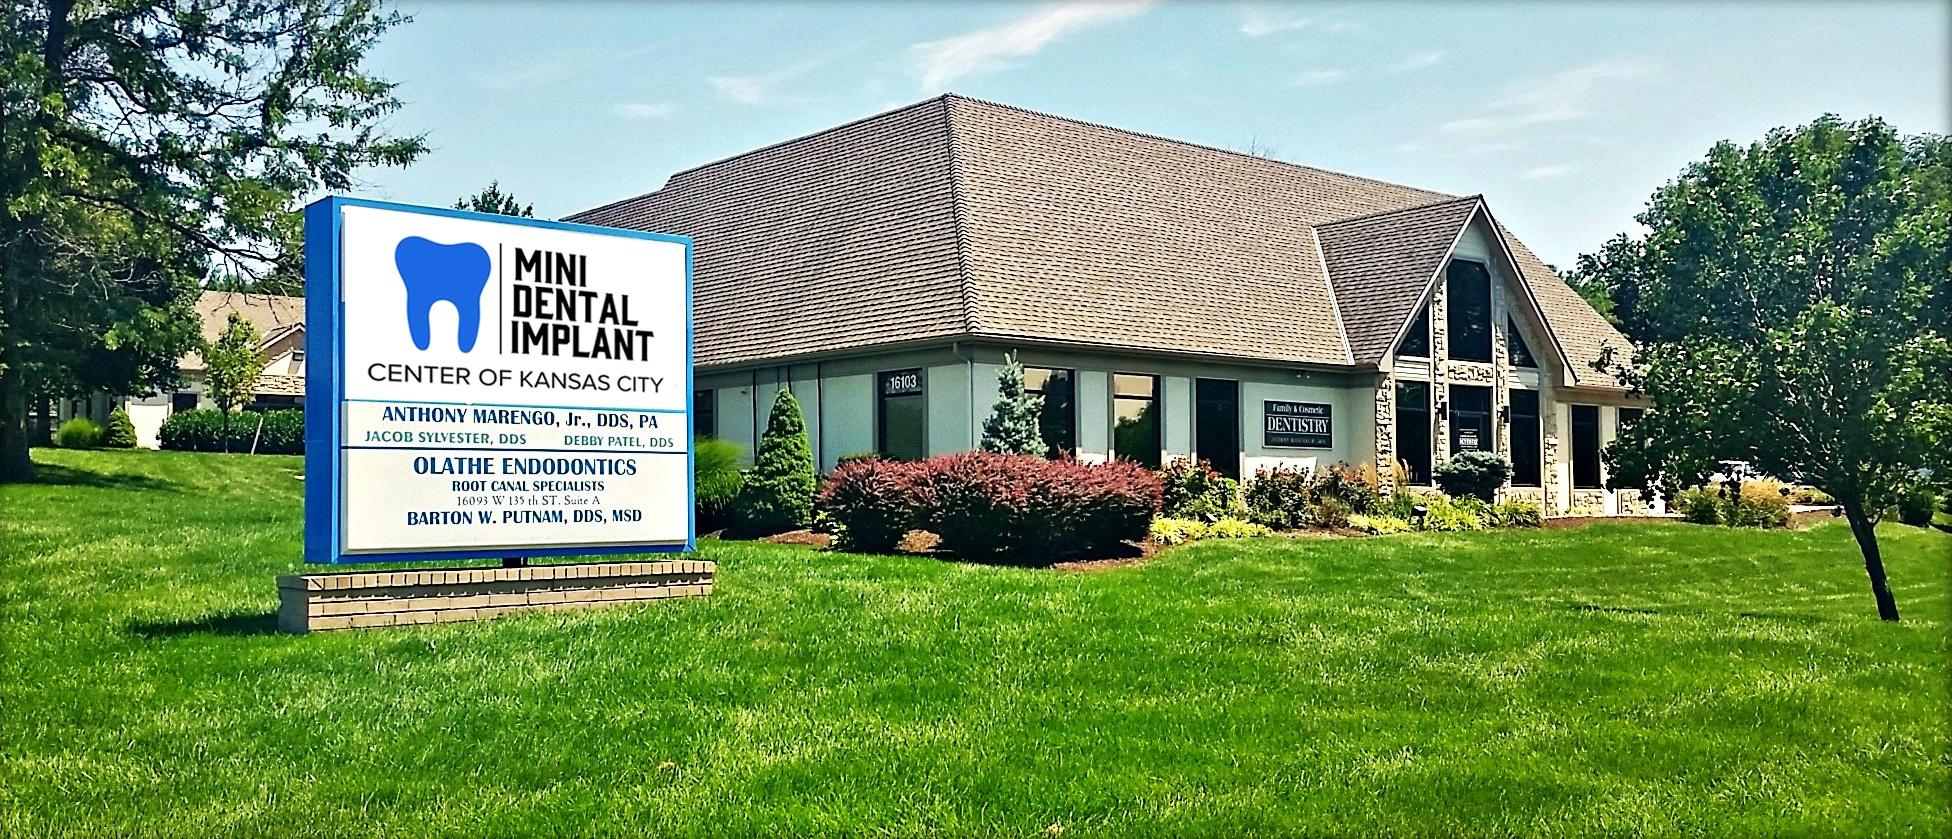 Mini Dental Implant Center Kansas City